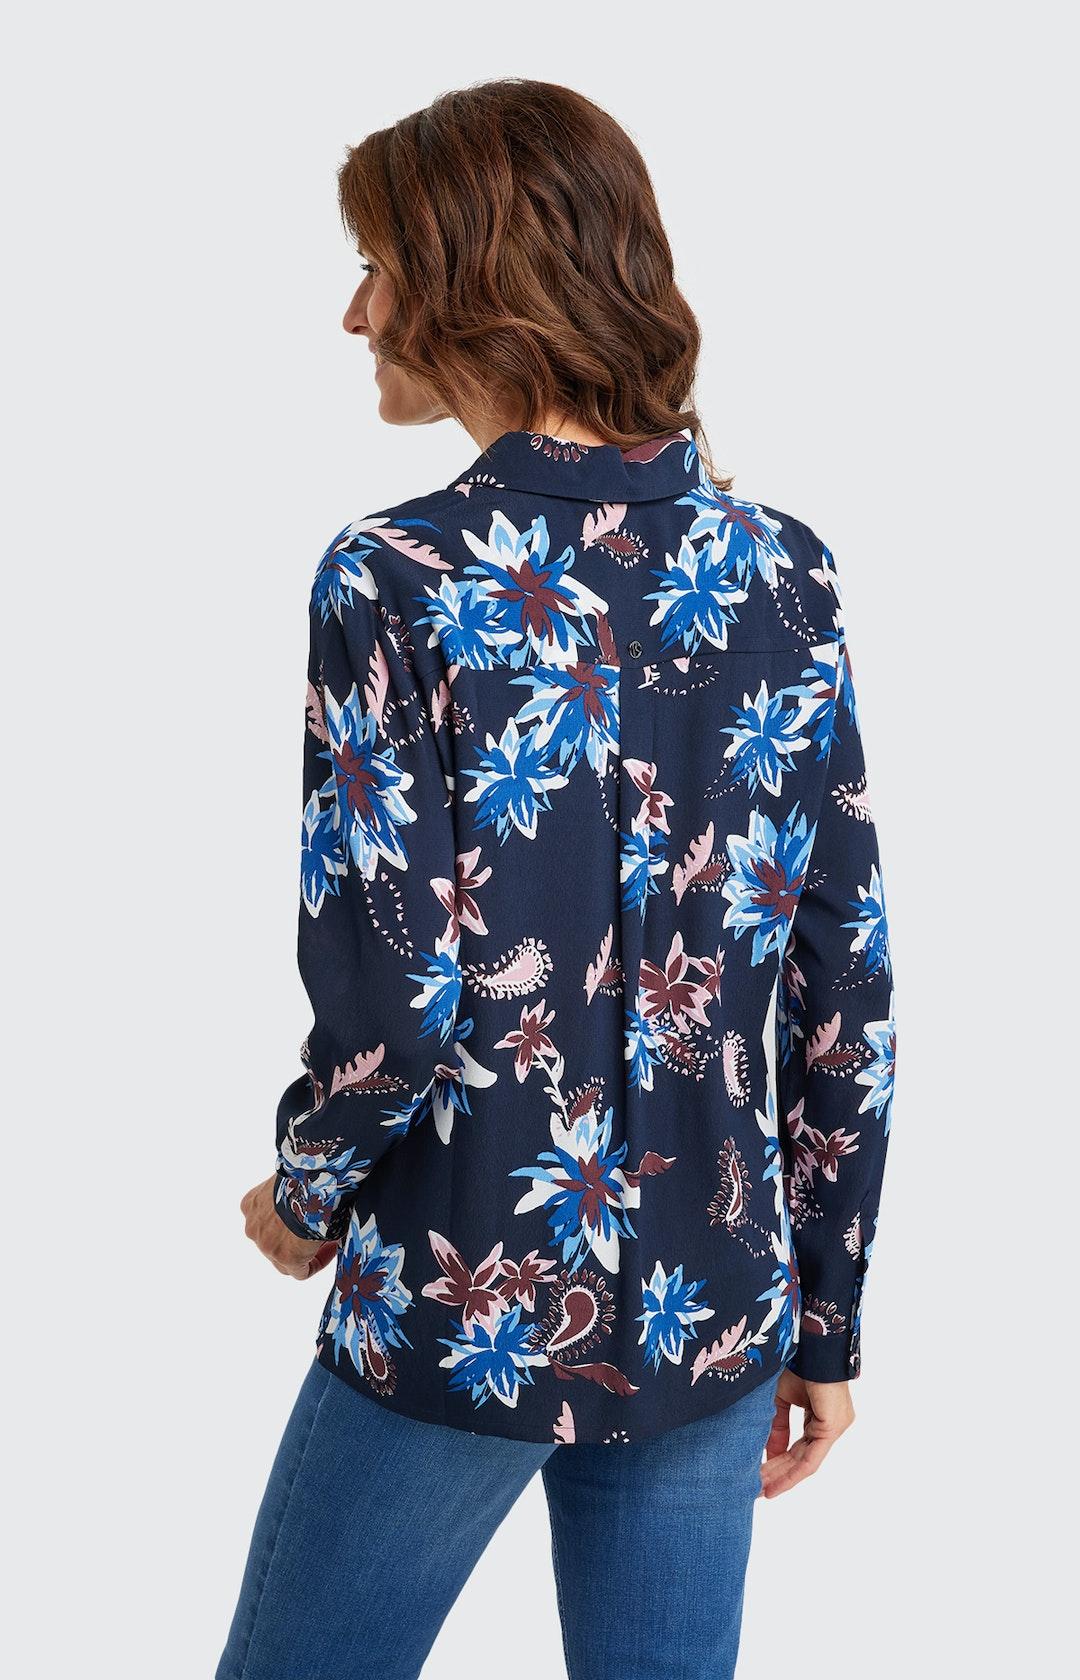 Bluse mit Allover-Muster in Dunkelblau